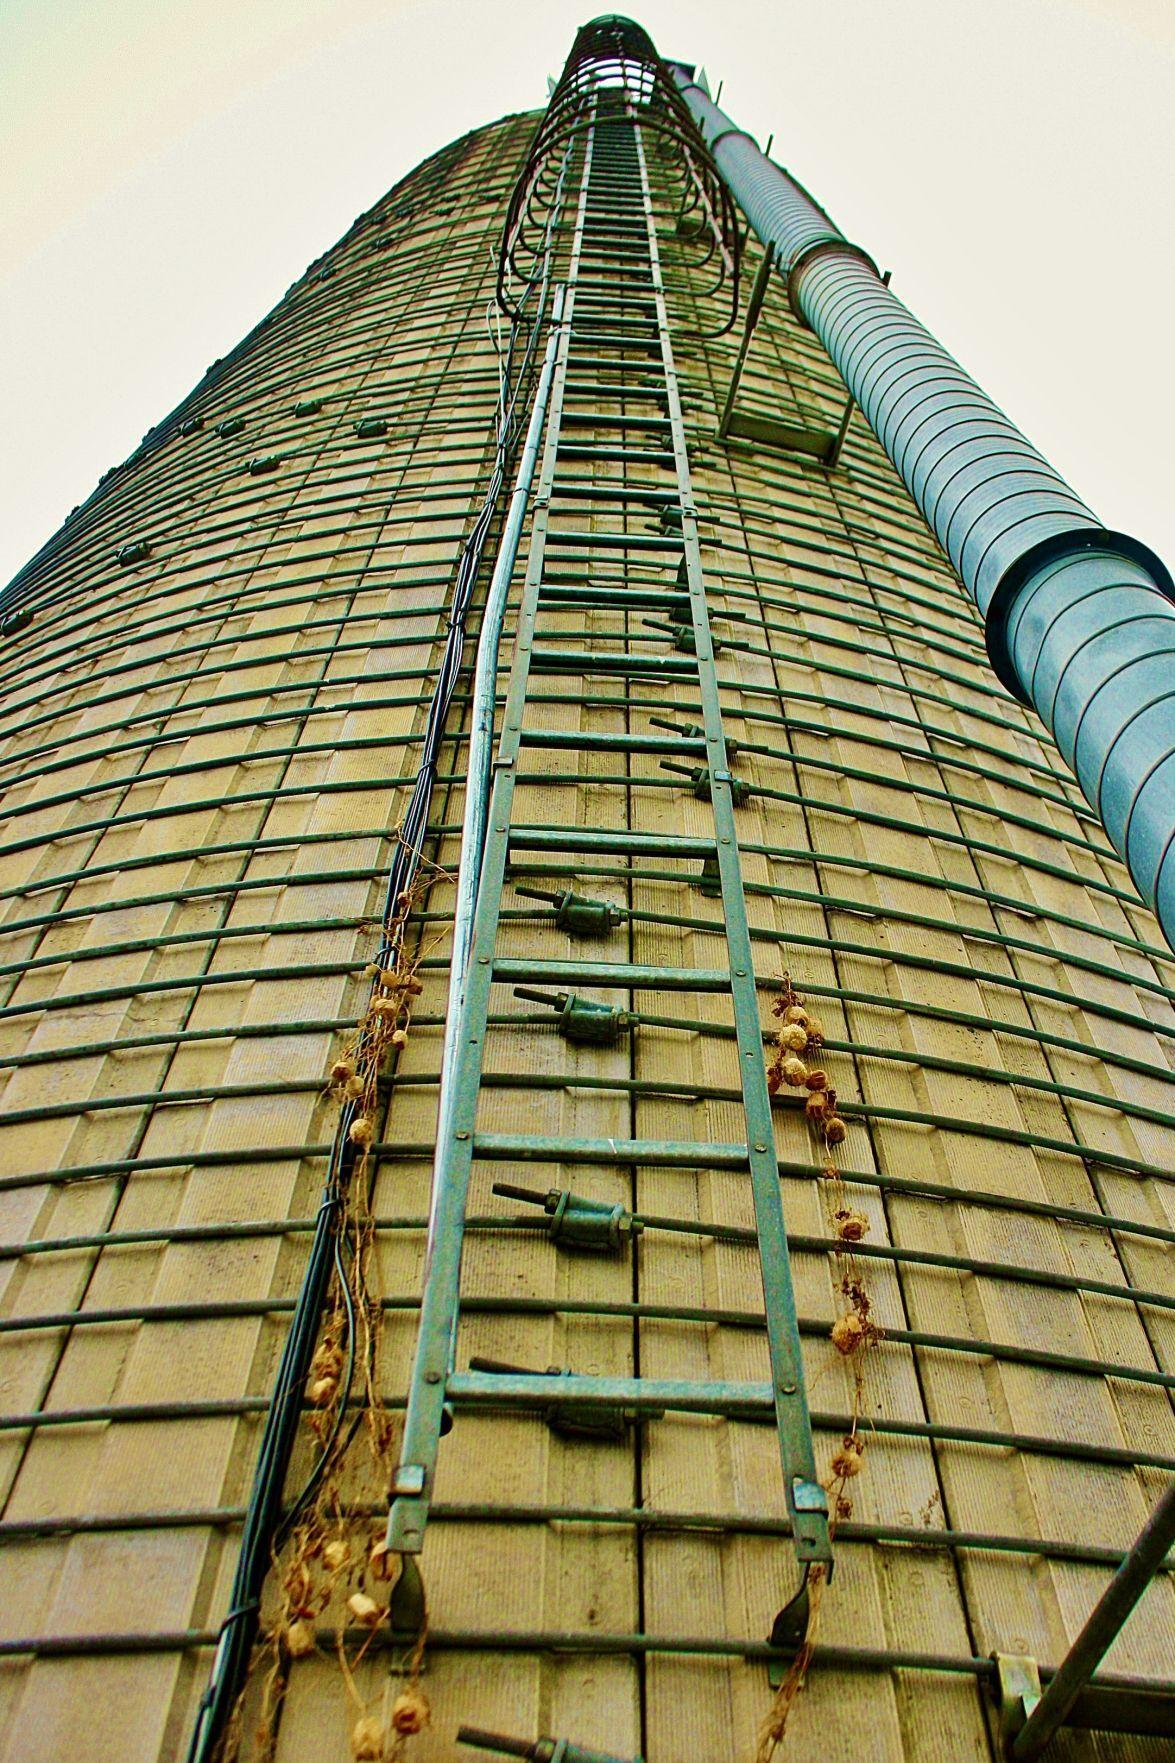 Tall silo